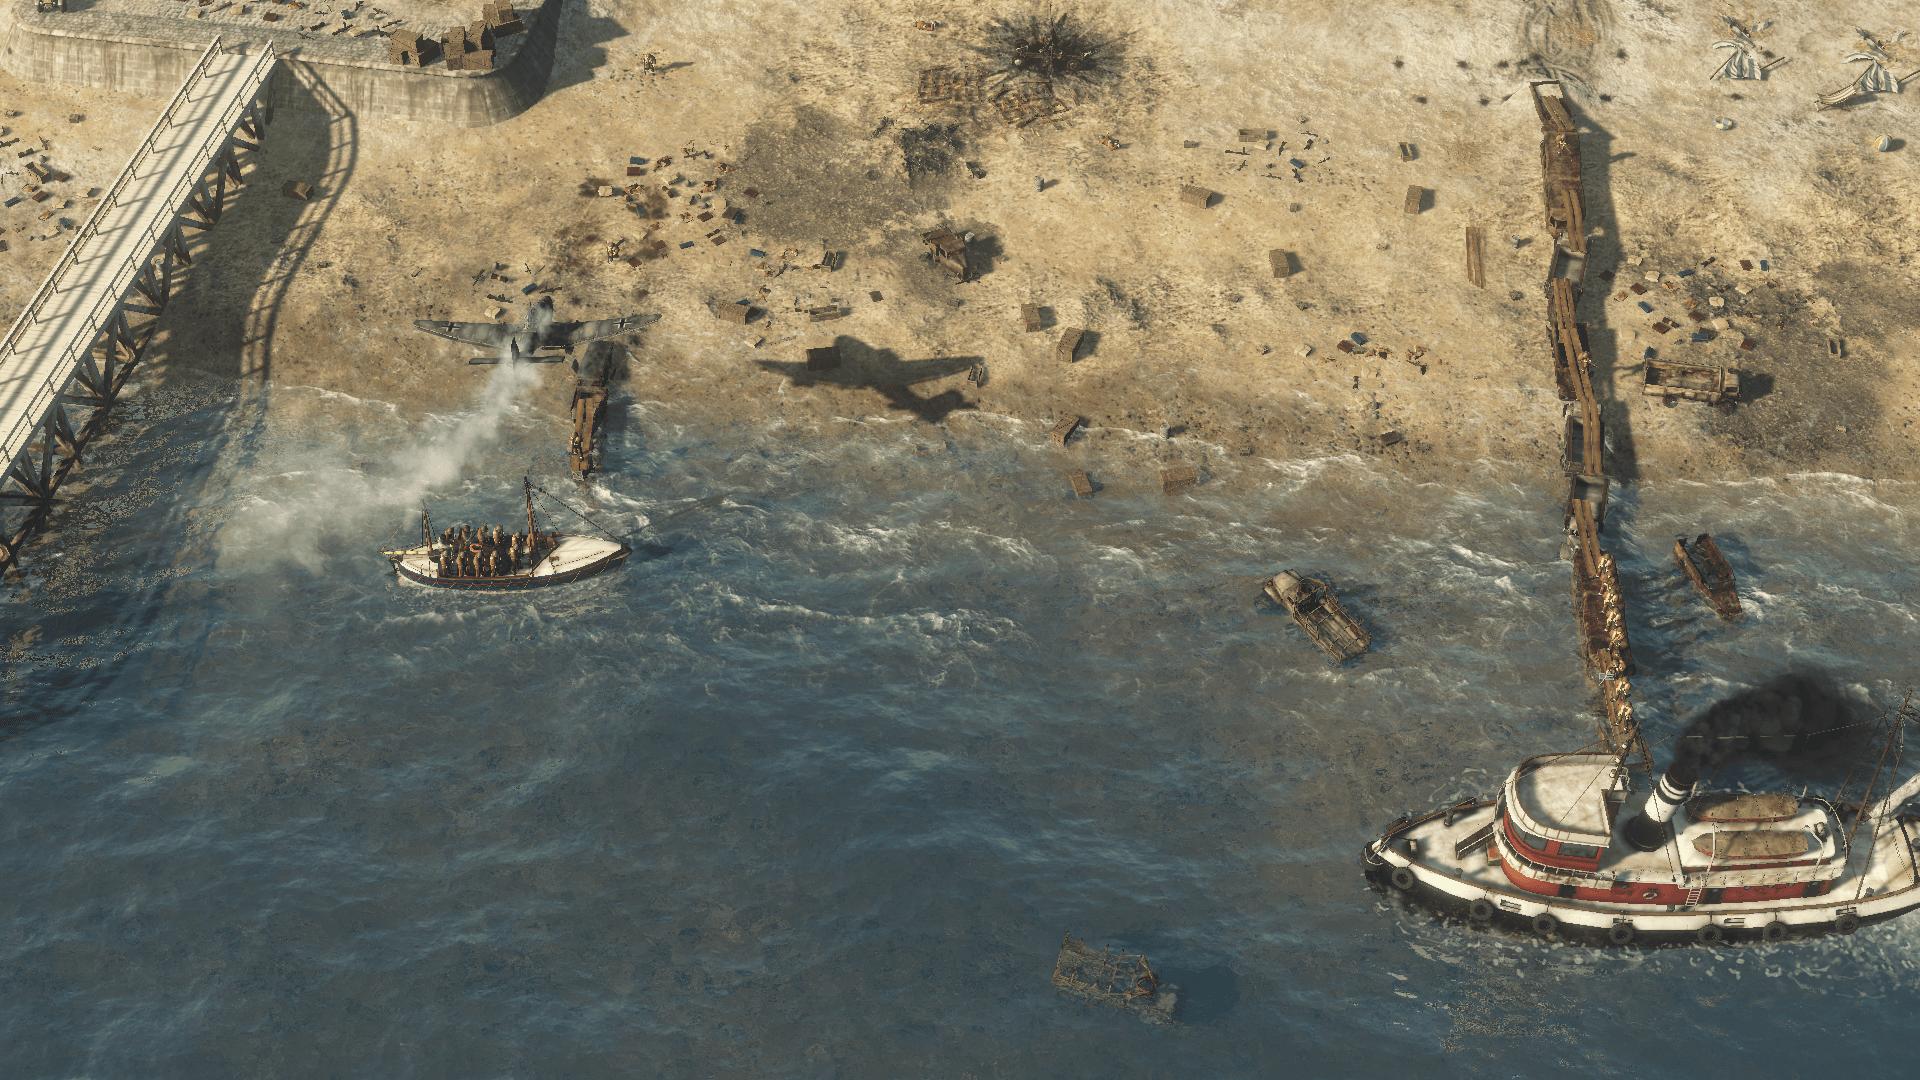 Sudden Strike 4: Road to Dunkirk